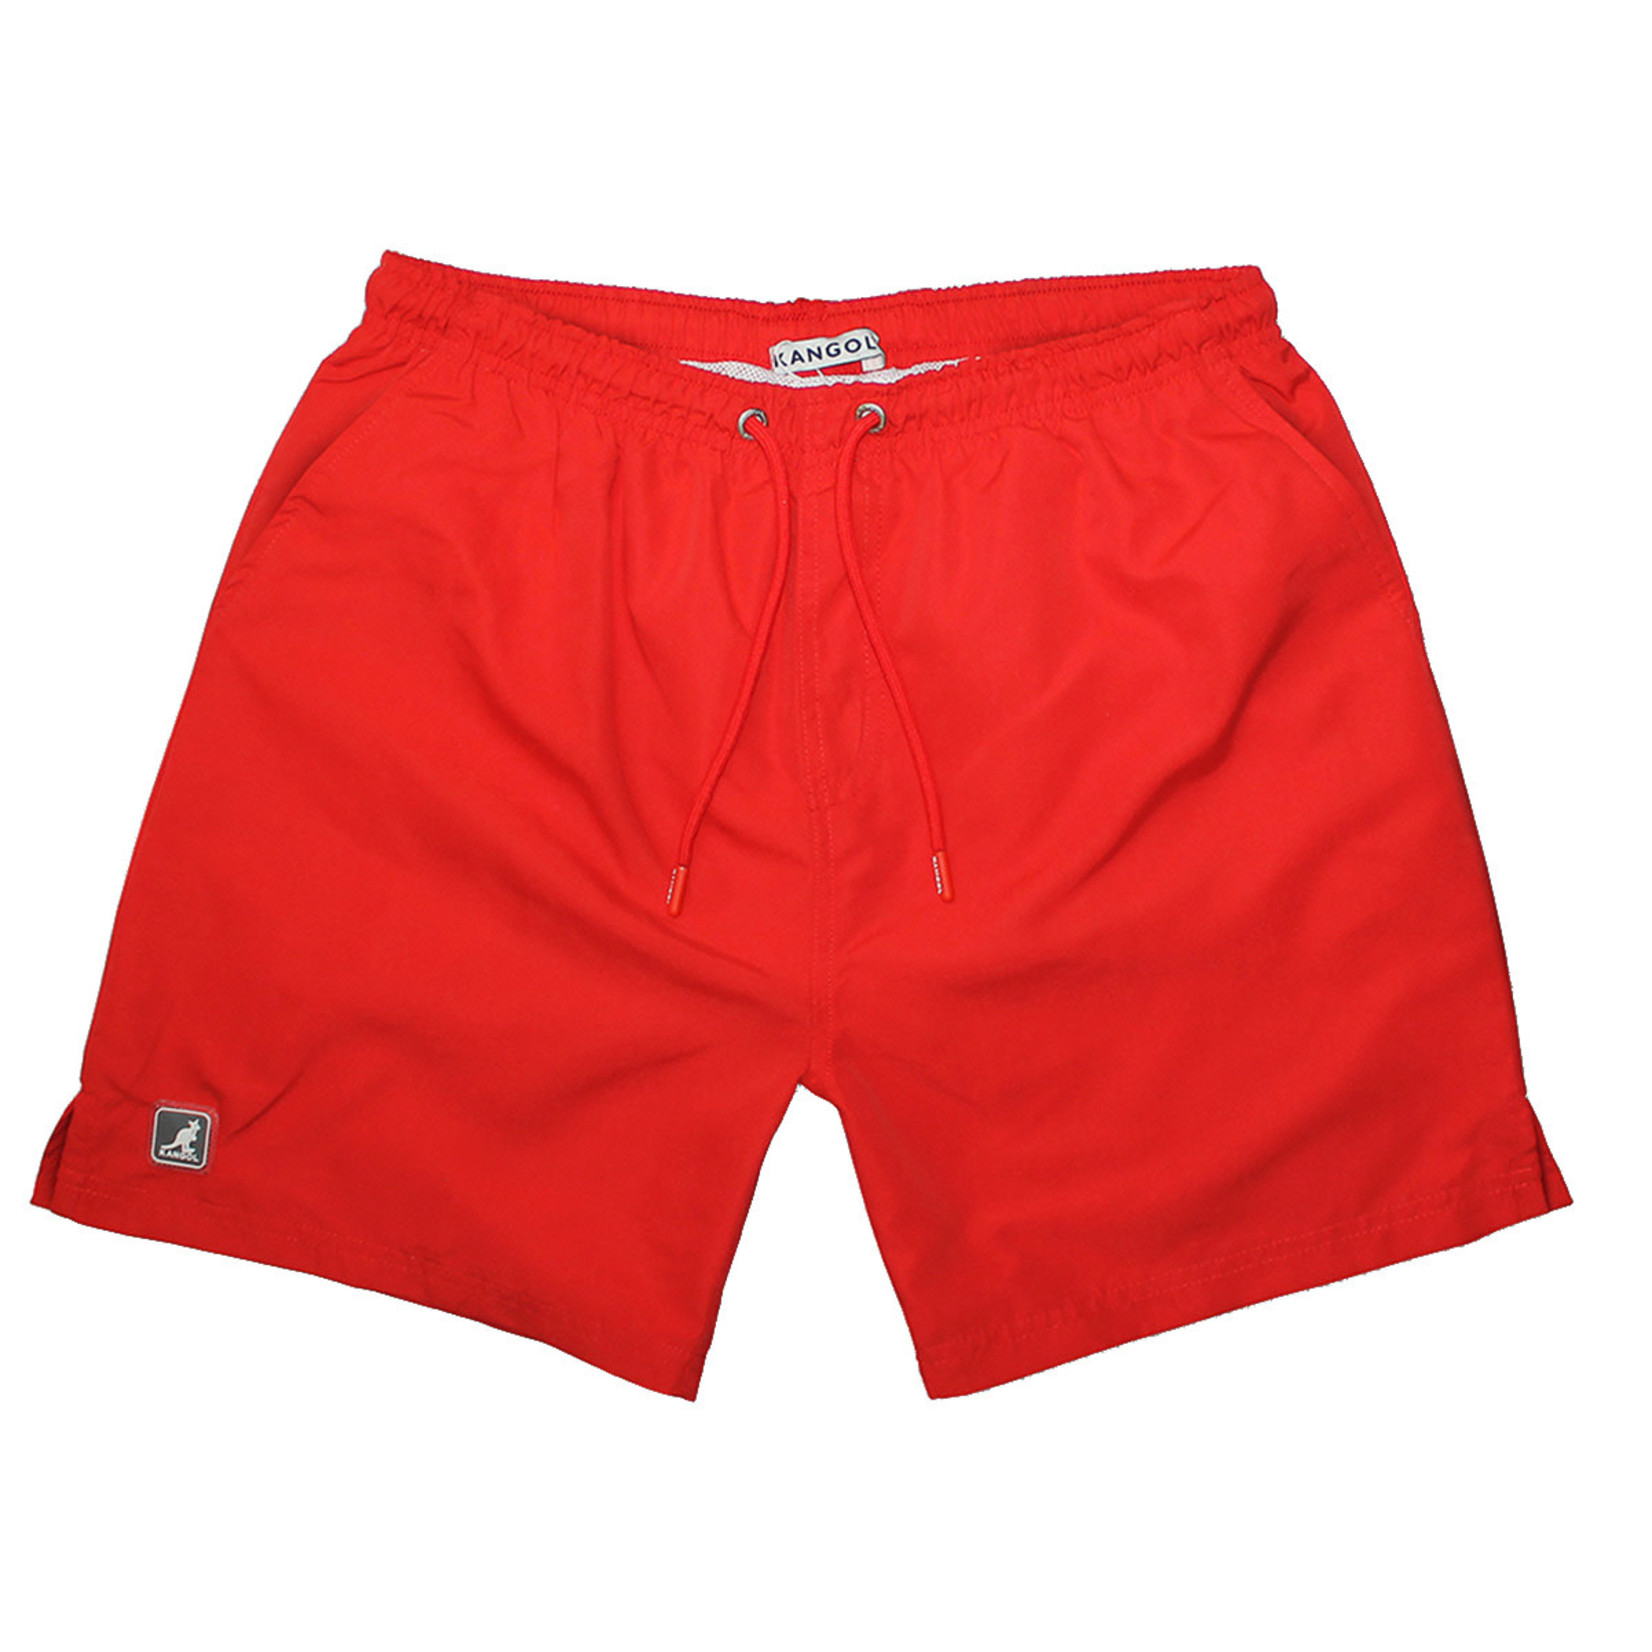 Kangol Kangol : Basic Swim Short